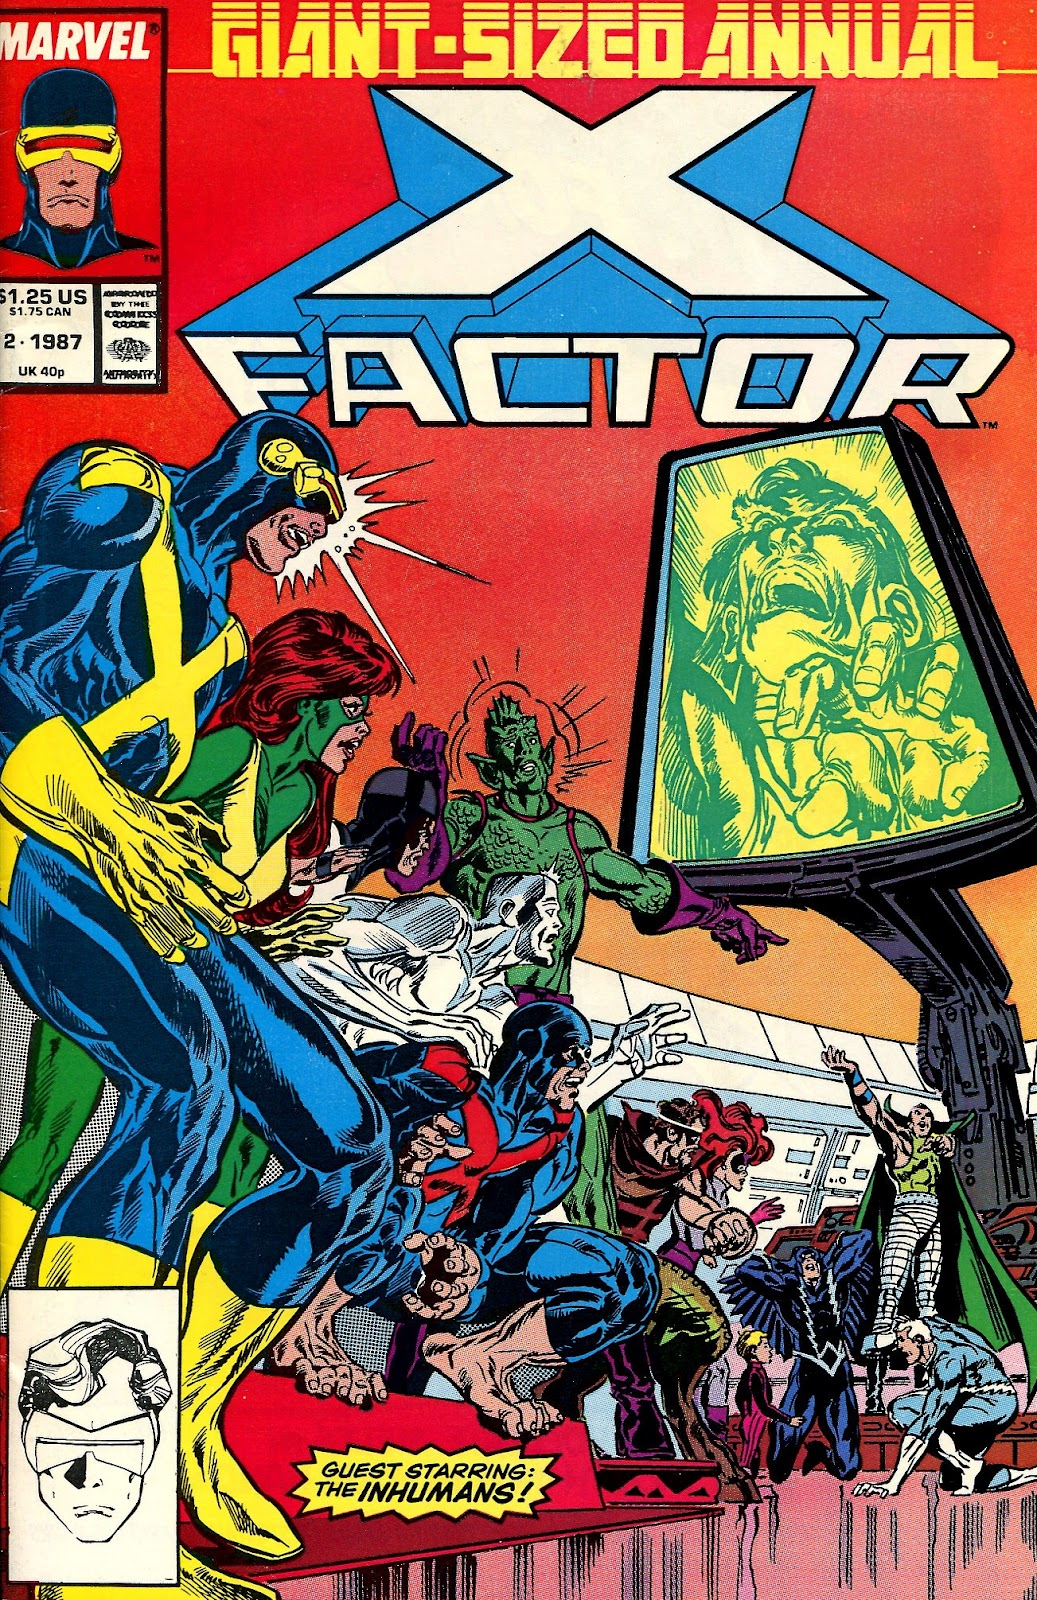 Super-DuperToyBox: X-Factor Annual Vol 1, #2 1987